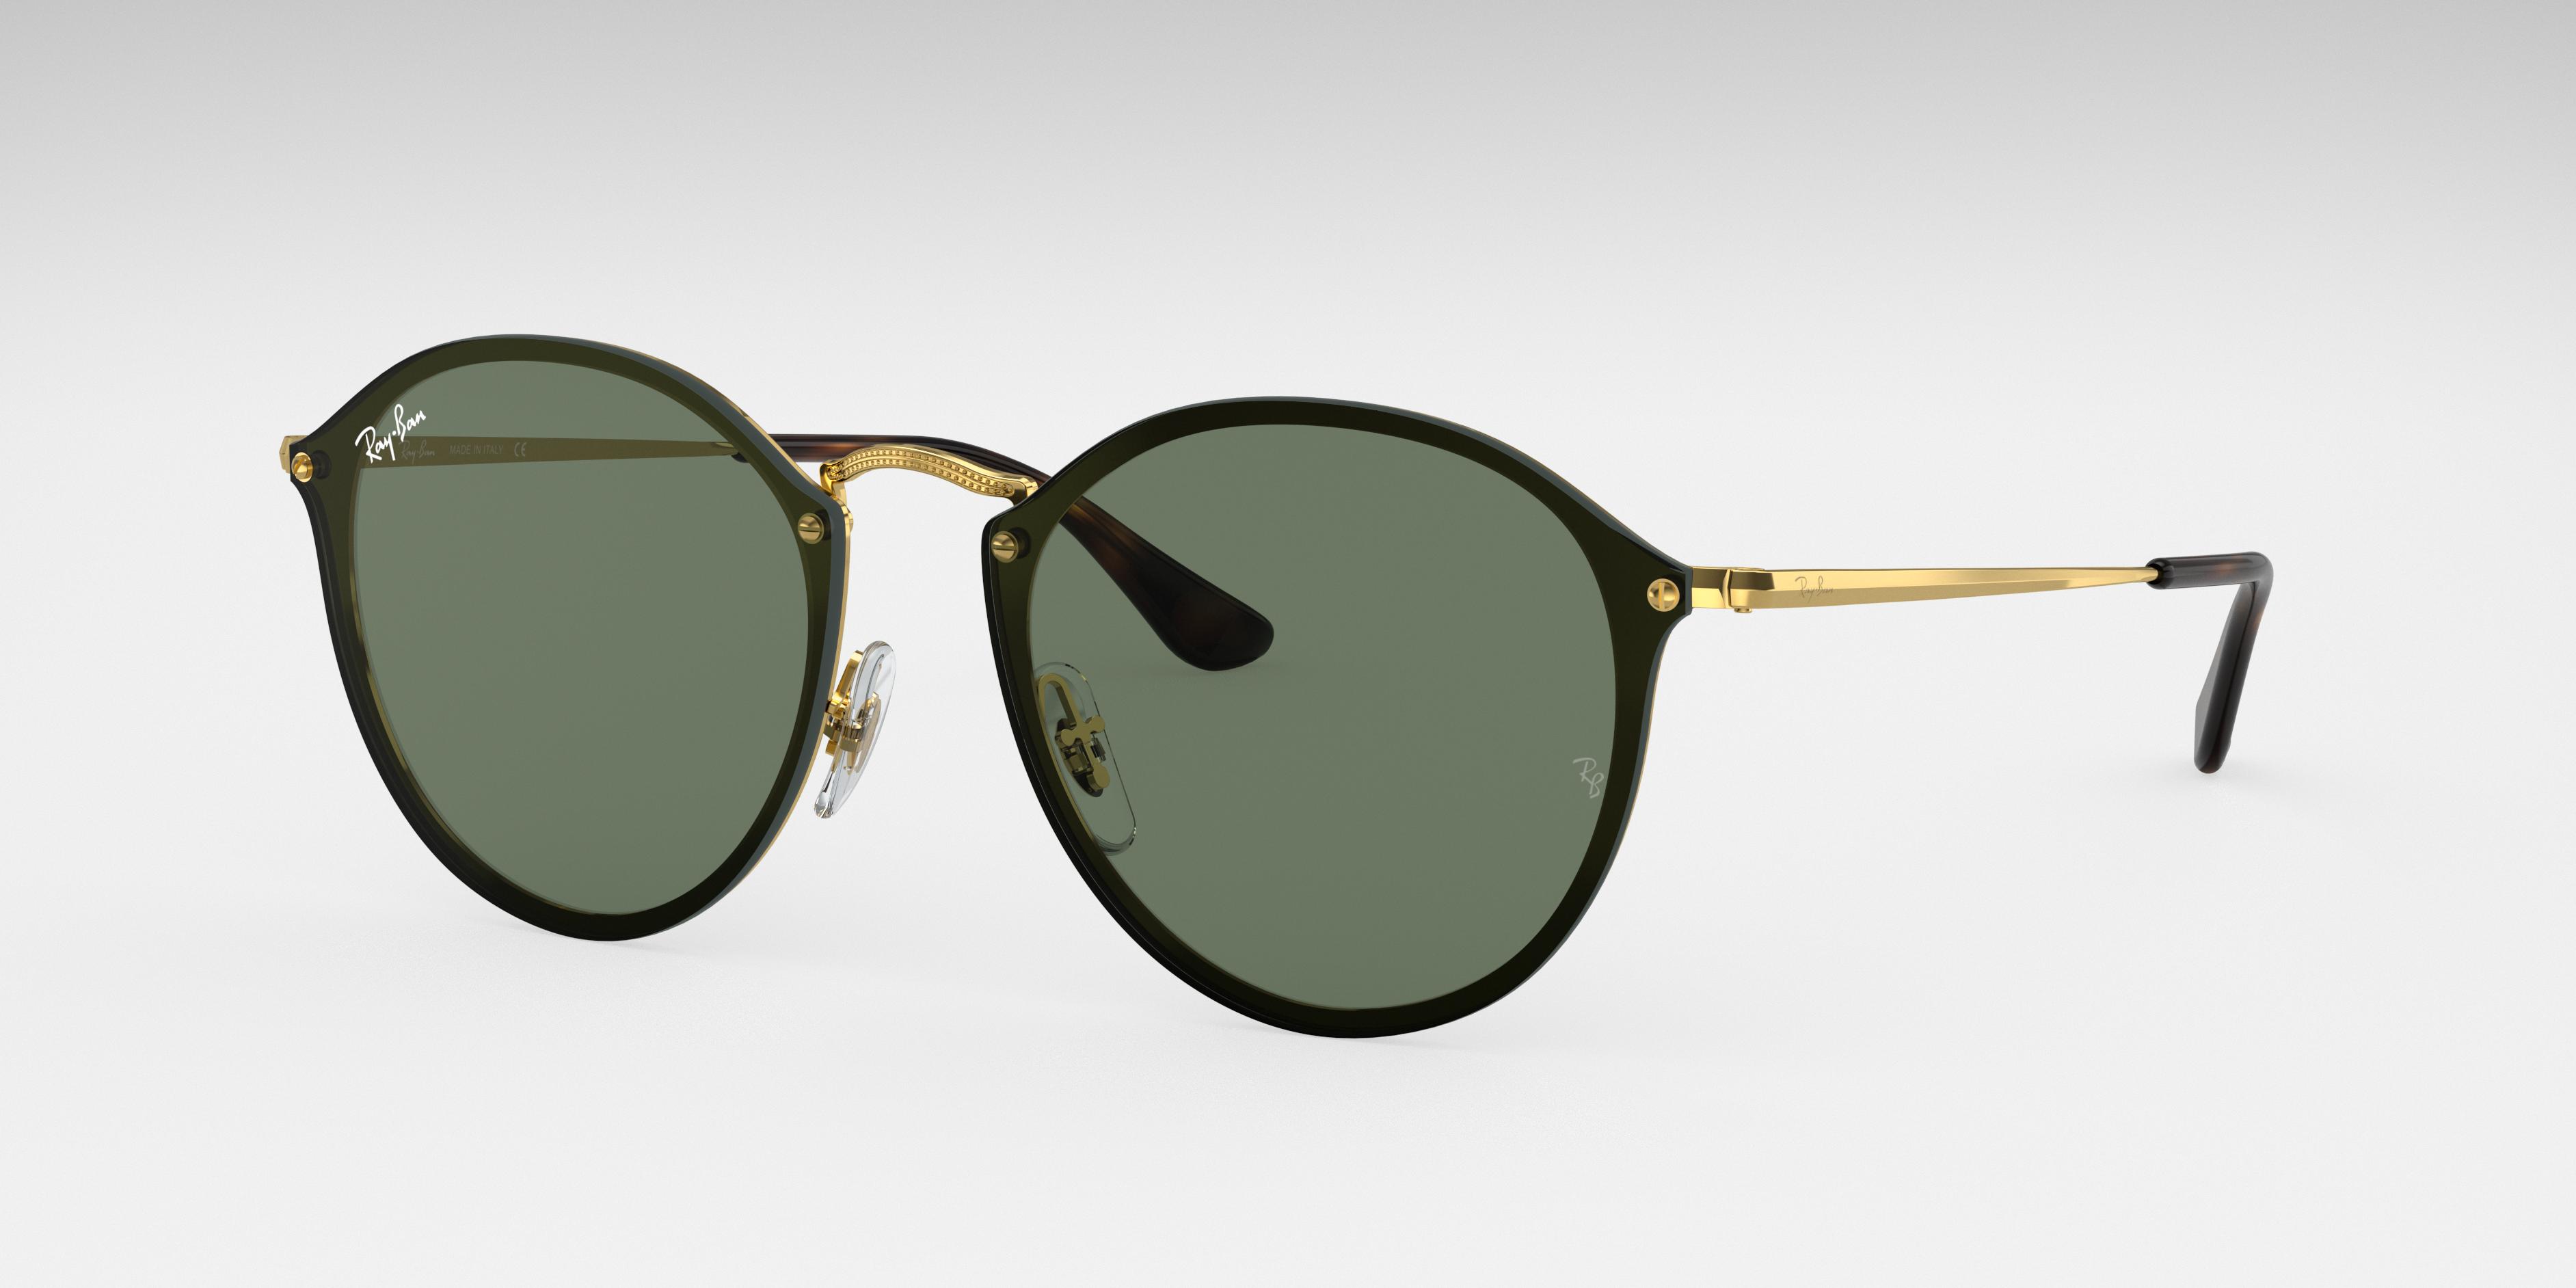 Ray-Ban Blaze Round Gold, Green Lenses - RB3574N